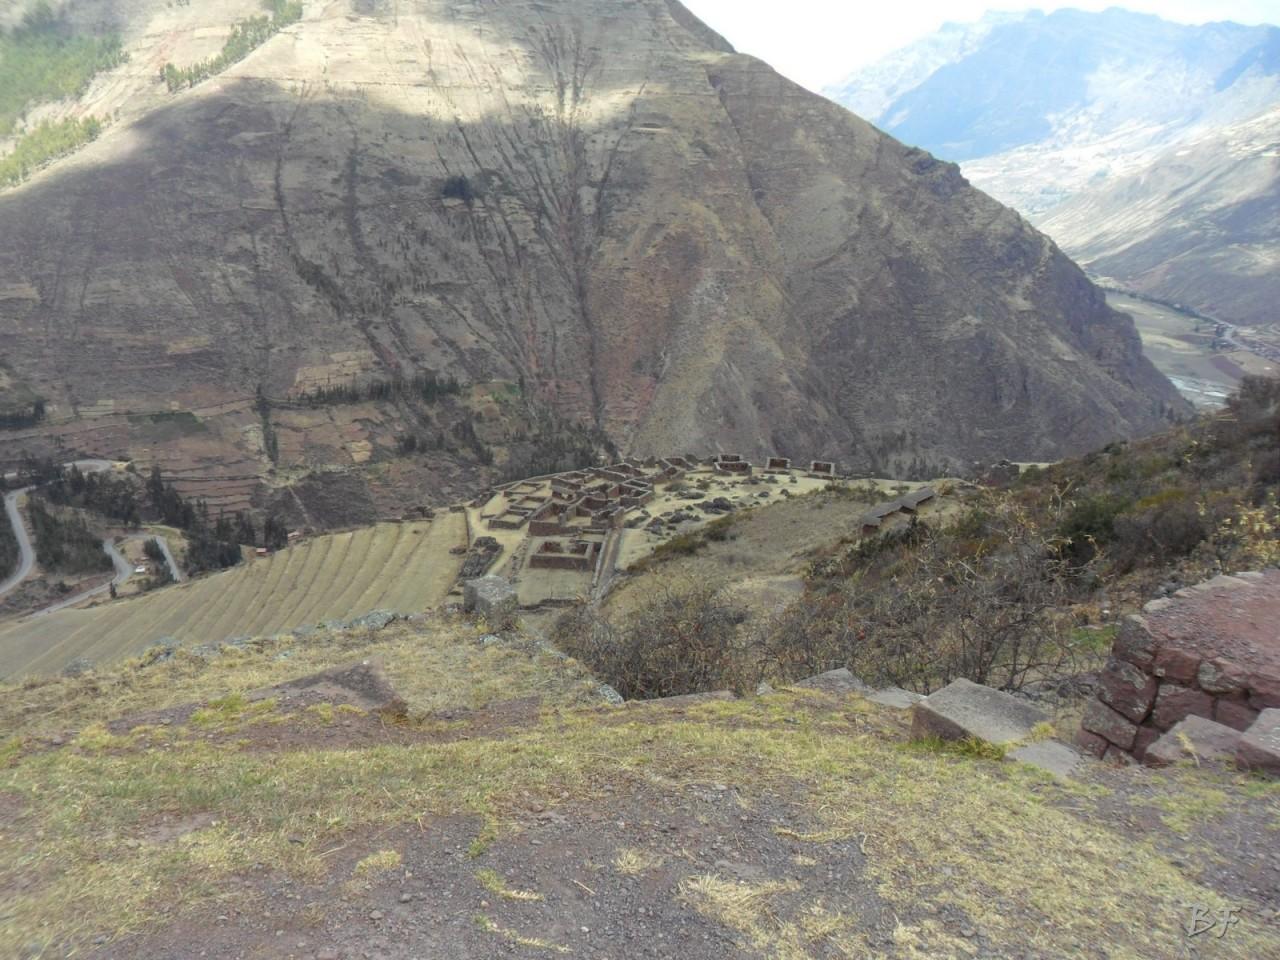 Mura-Poligonali-Megaliti-Altari-Rupestri-Pisac-Cusco-Perù-63